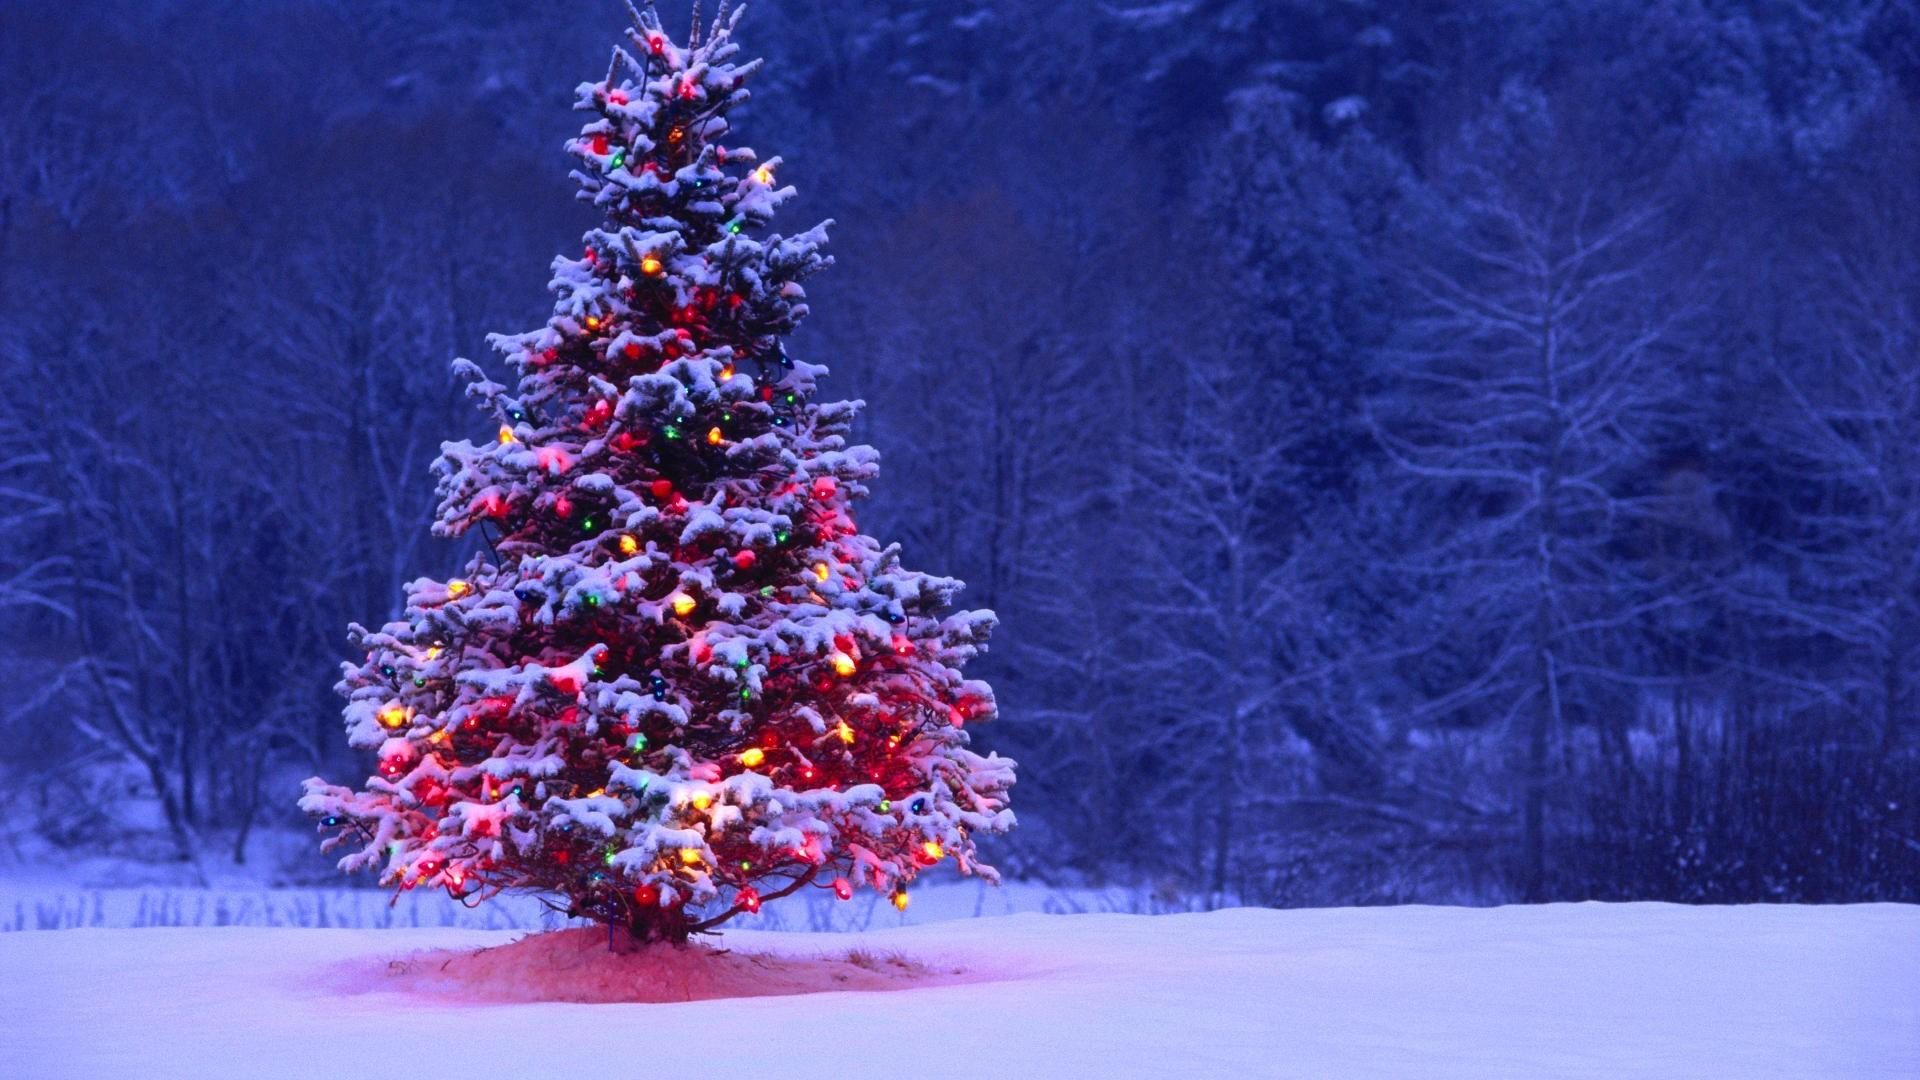 Free 3D Animated Christmas Wallpaper | Unfortunately, My 3D Christmas Tree Animated  Wallpaper is not … | Christmas | Pinterest | Christmas tree, Animated …